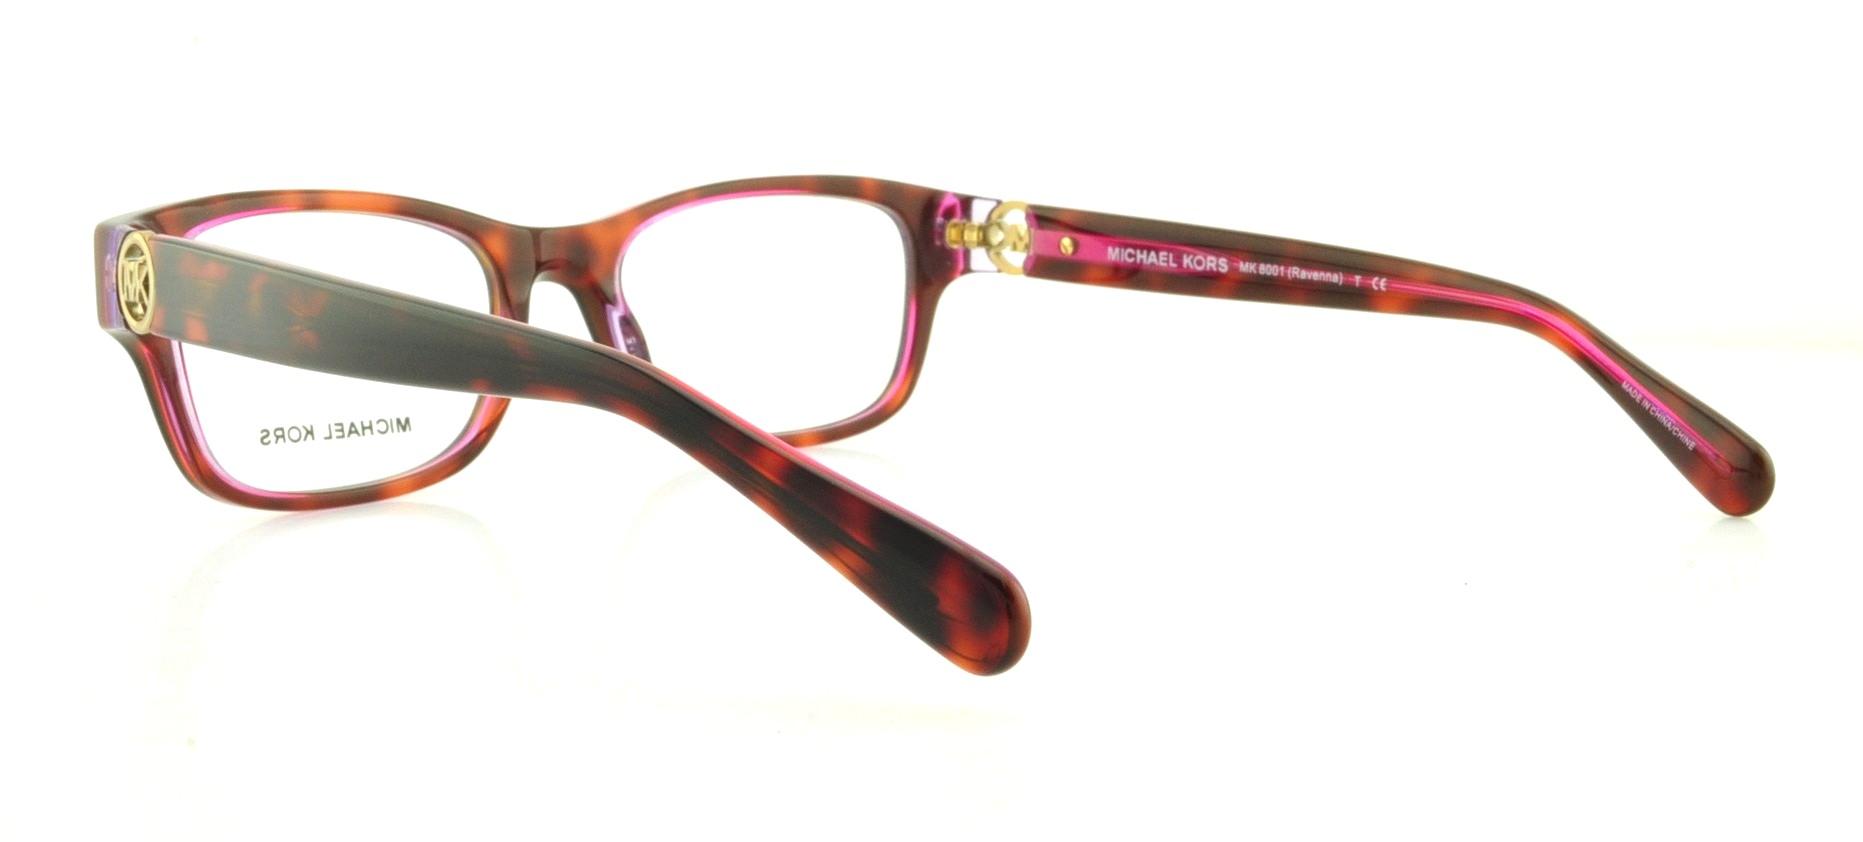 31cc82ac4ab4d5 MICHAEL KORS Eyeglasses MK8001 RAVENNA 3003 Tortoise Pink Purple 51MM -  Walmart.com